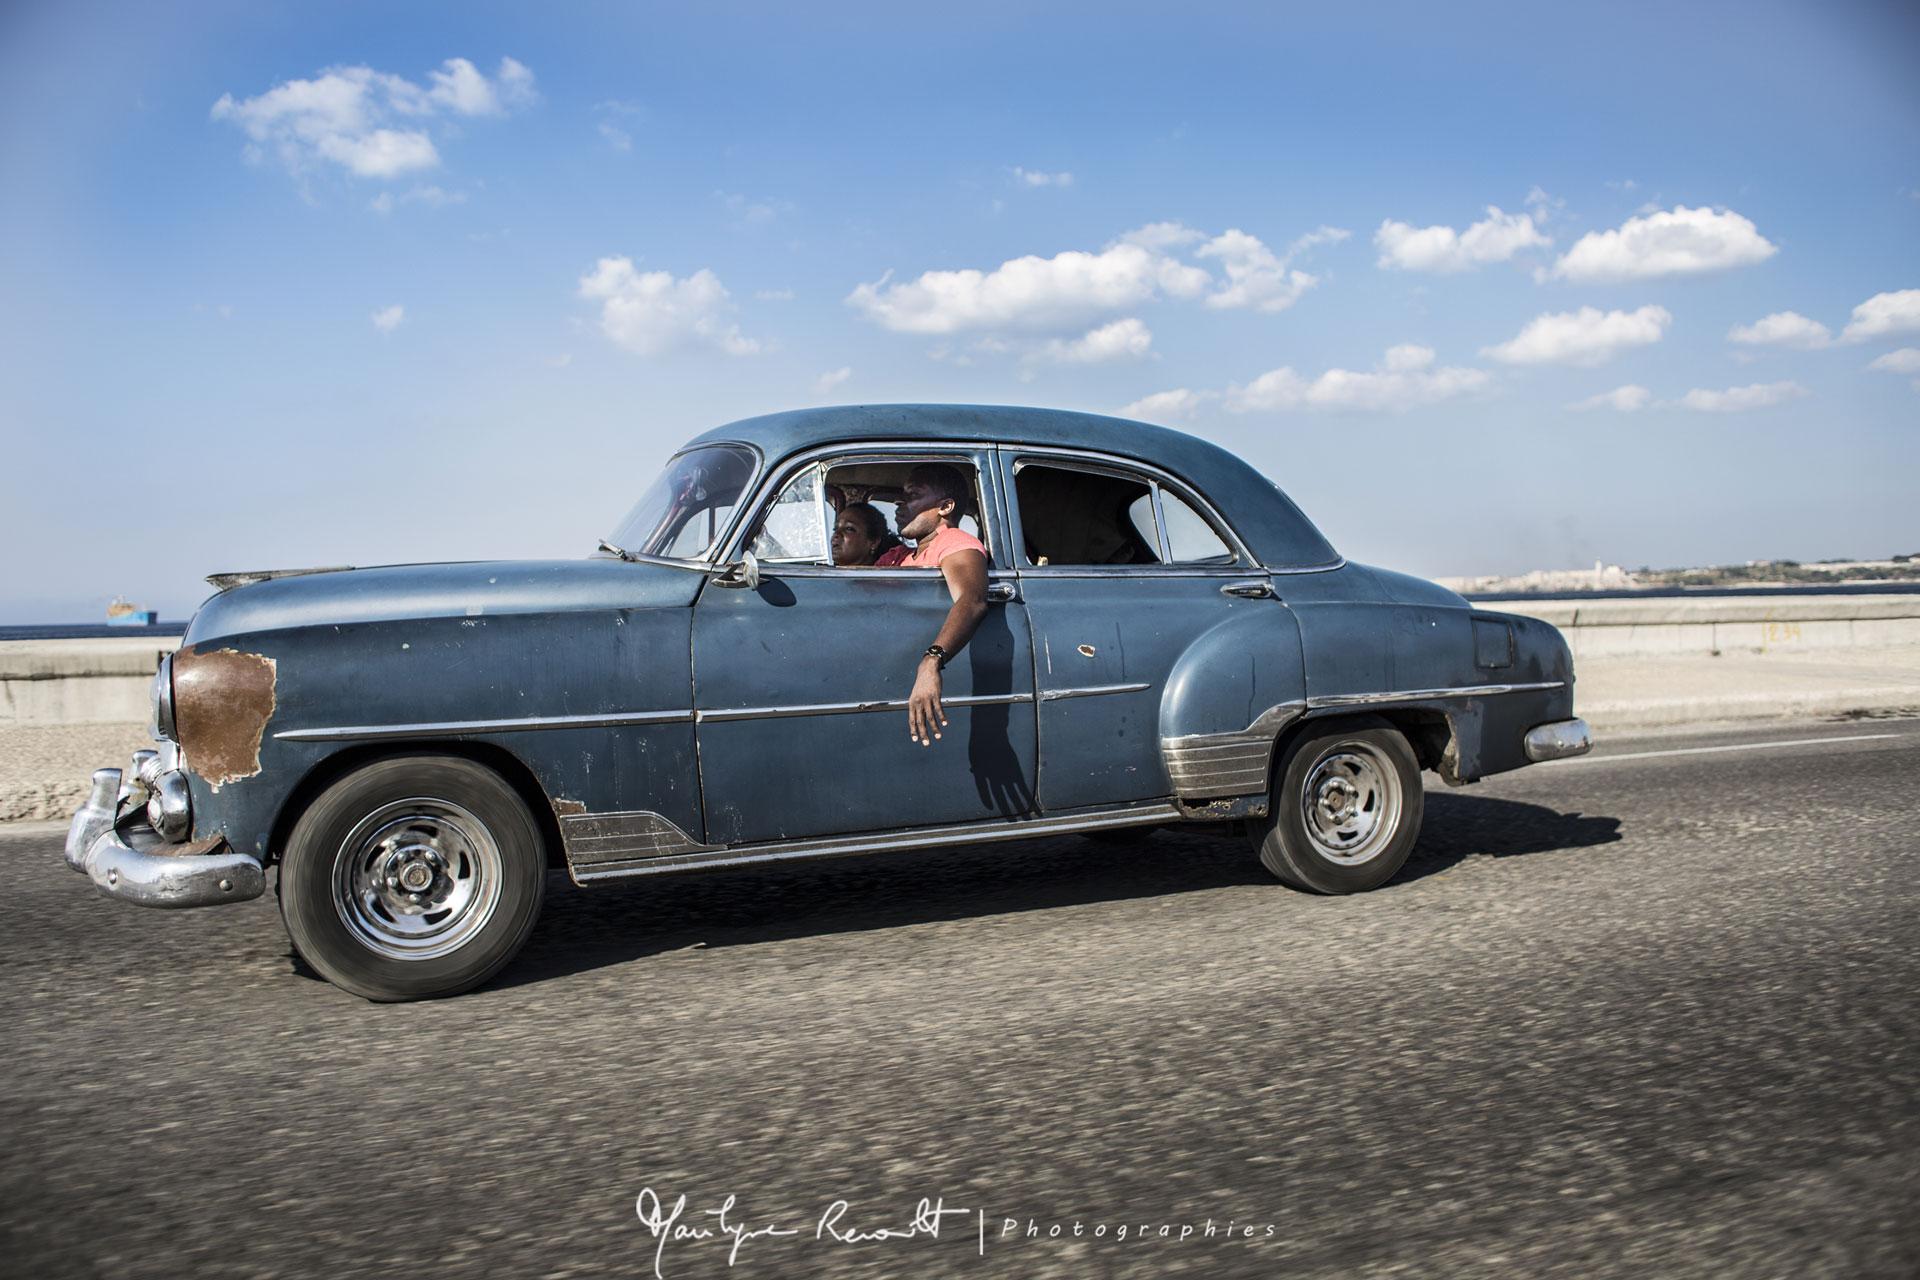 16-Cuba-marilyne renoult.jpg